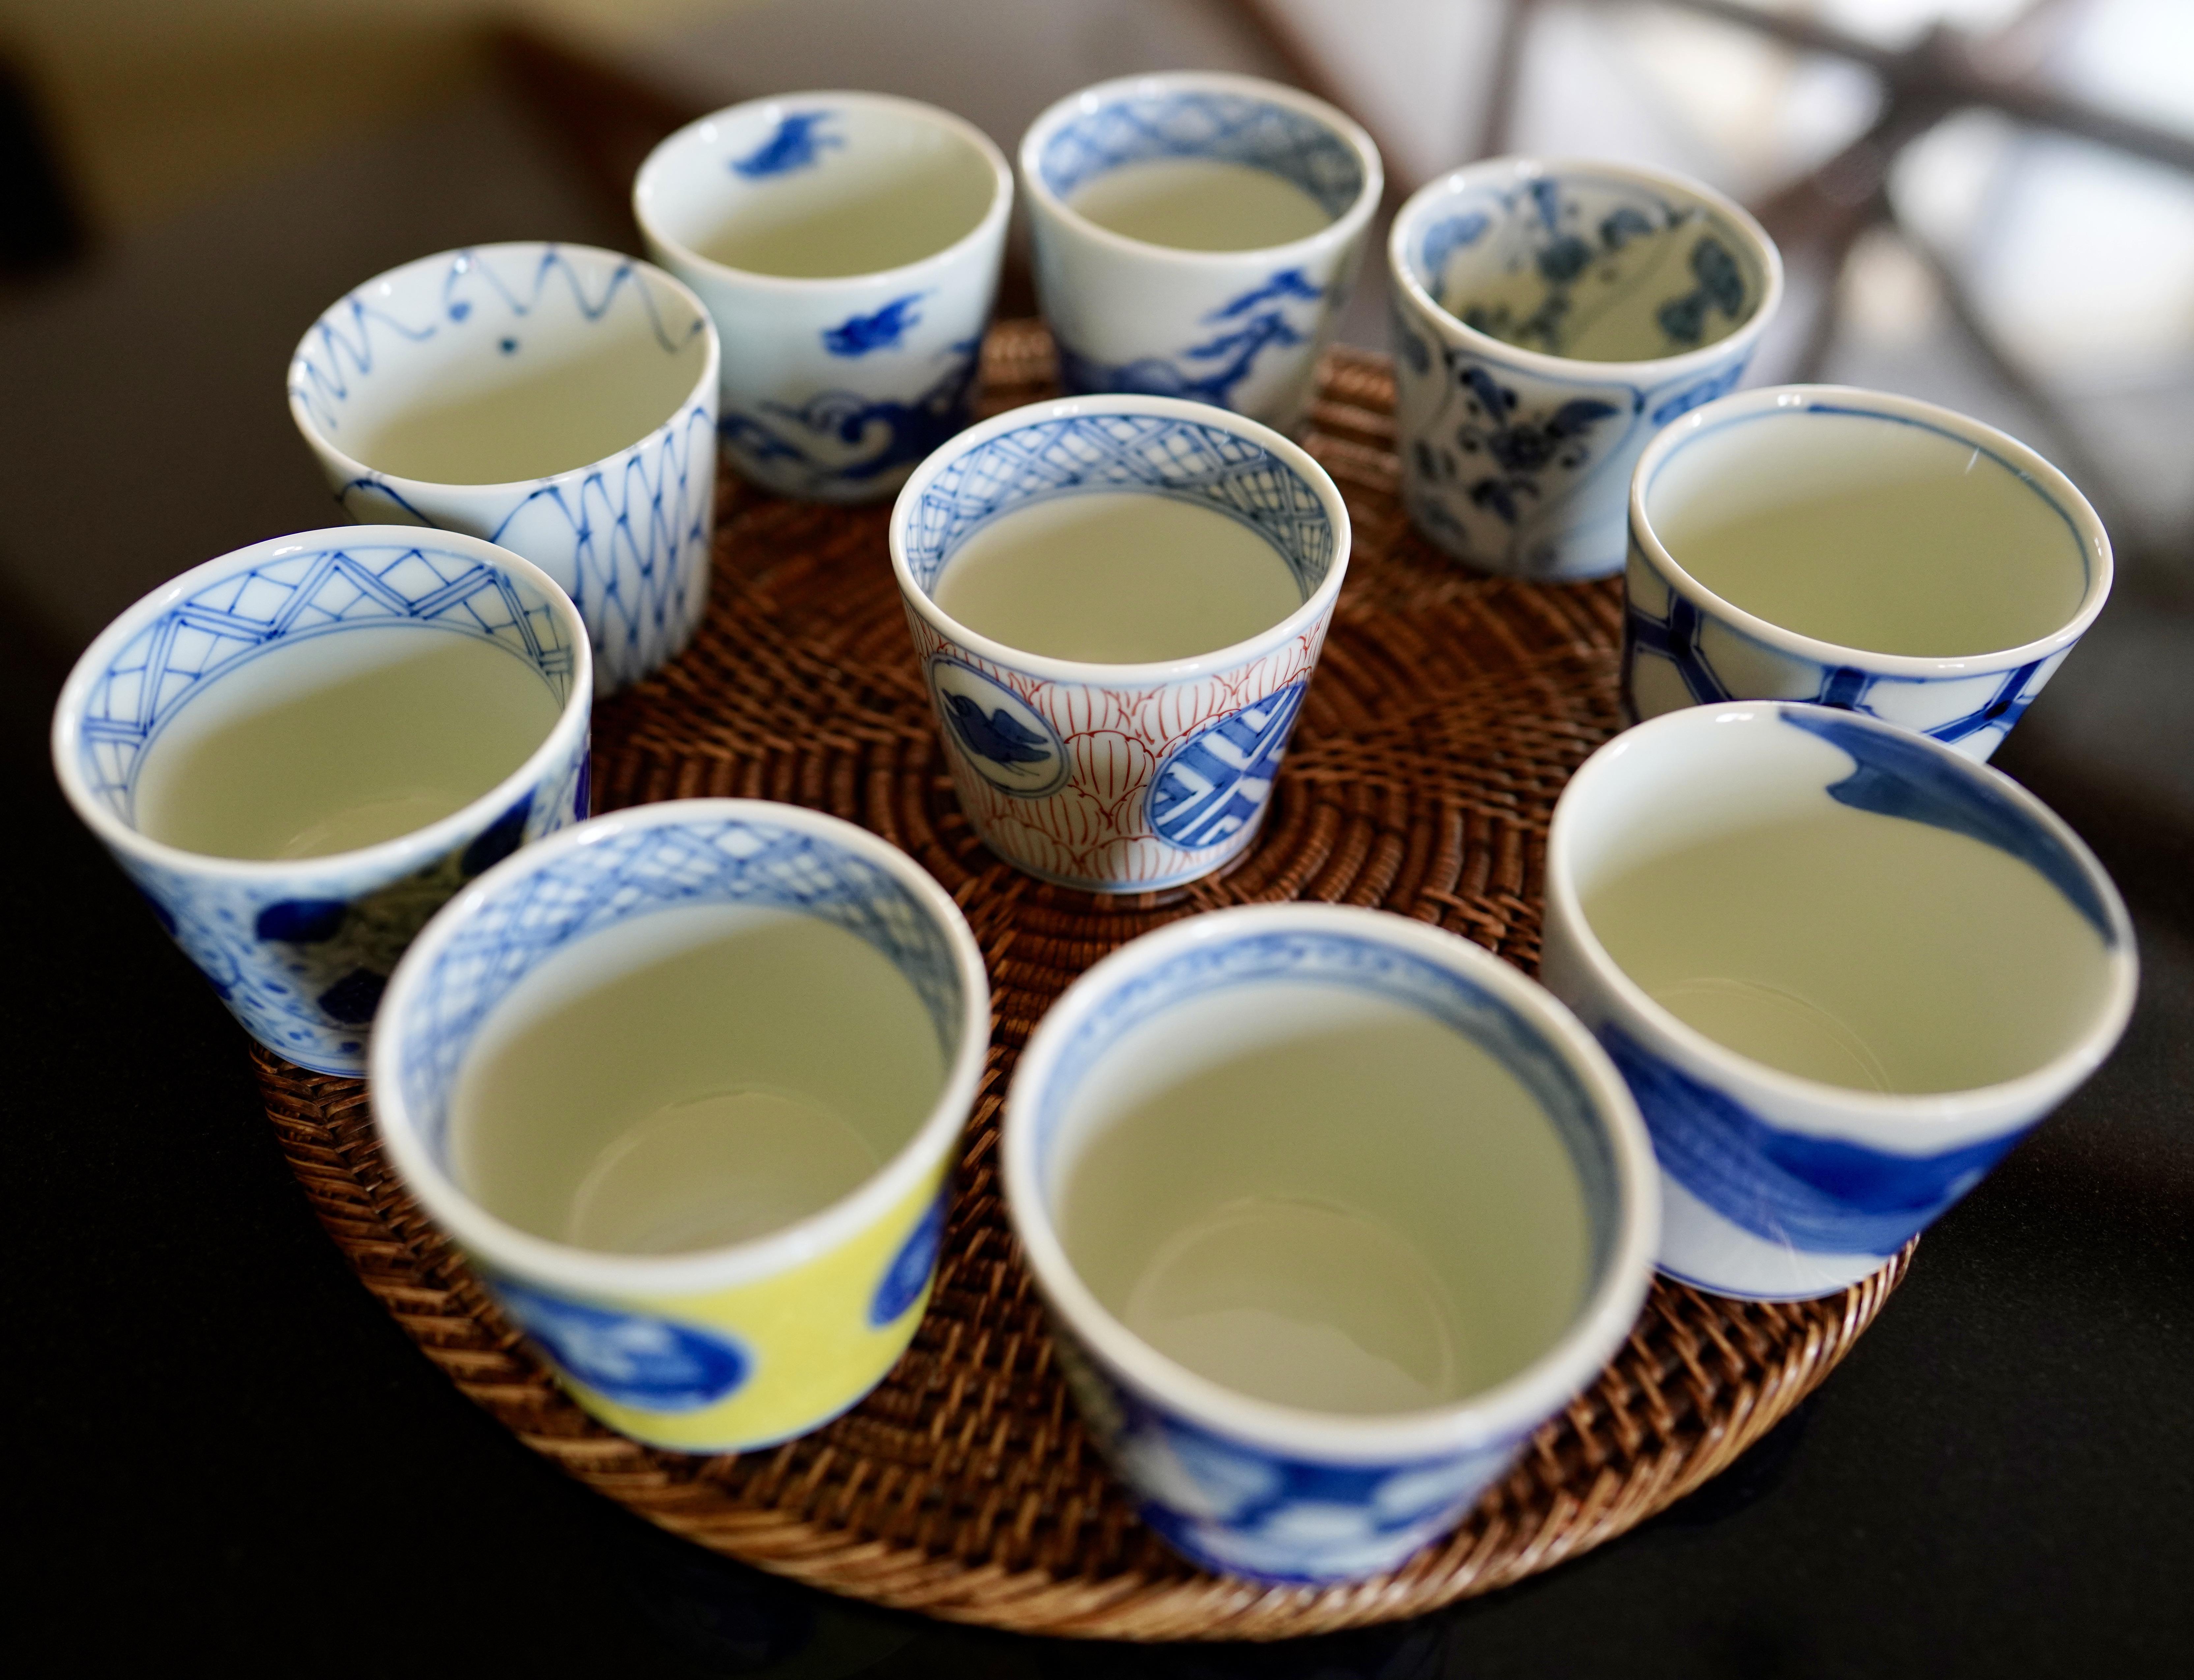 10 choko for Japanese buckwheat noodles